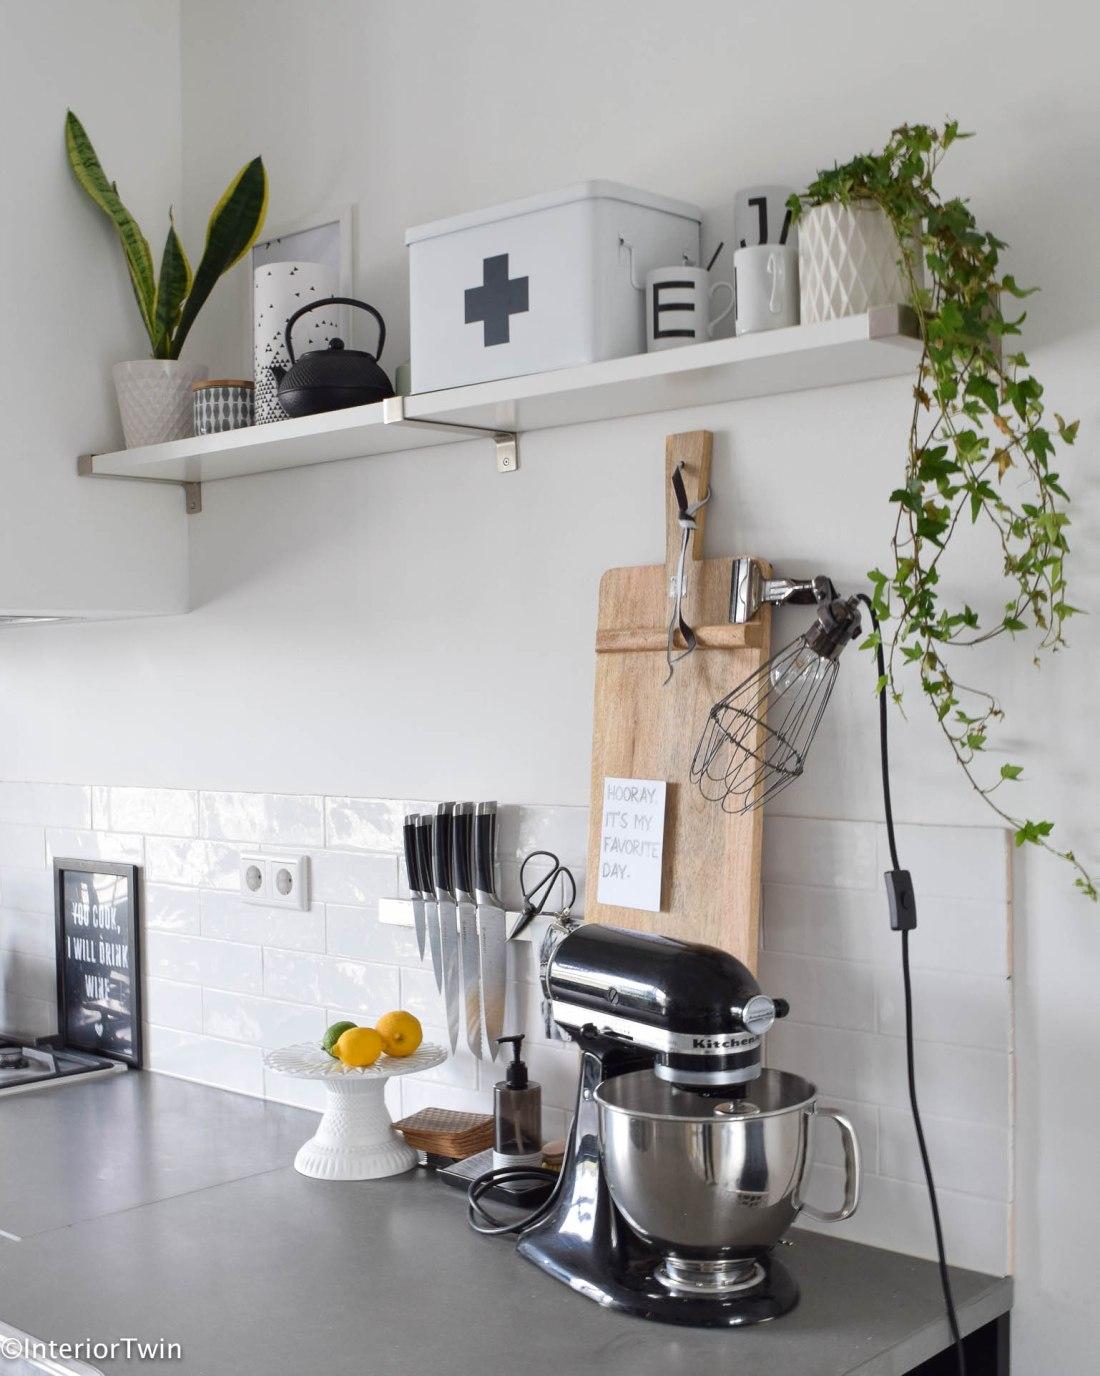 Zwarte keuken: voeg planten toe - InteriorTwin